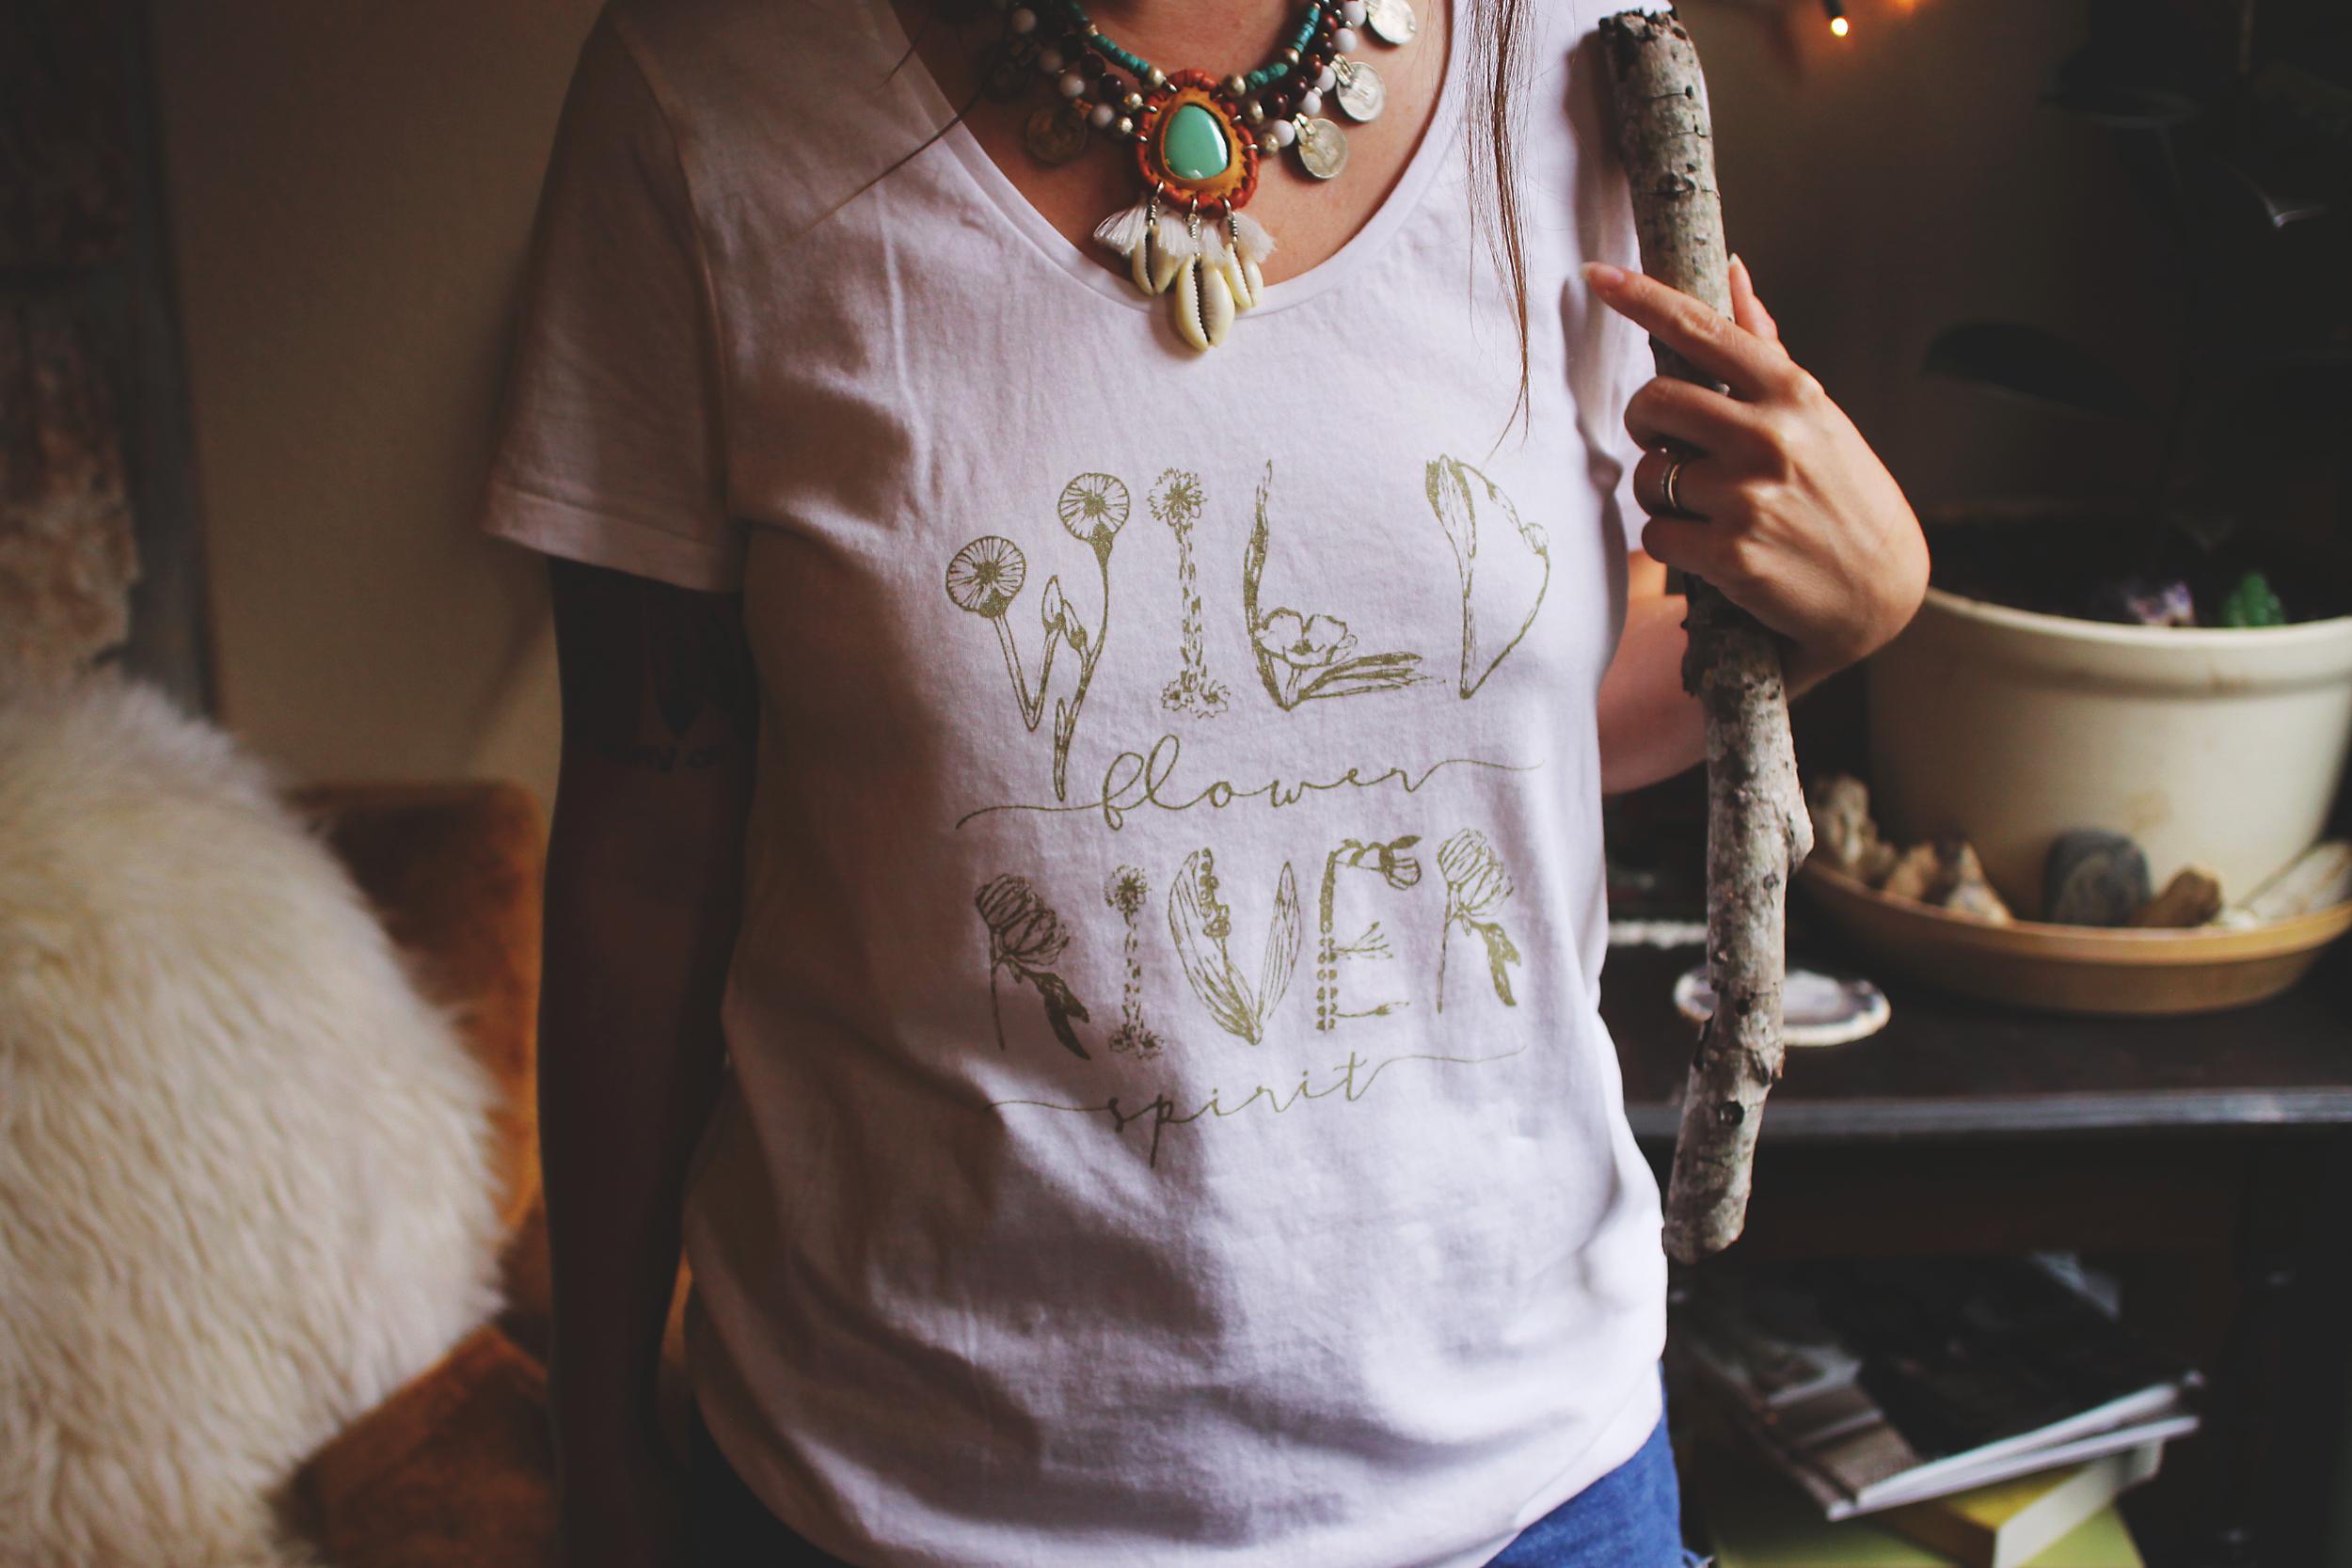 Skyline Fever Wild River Tee